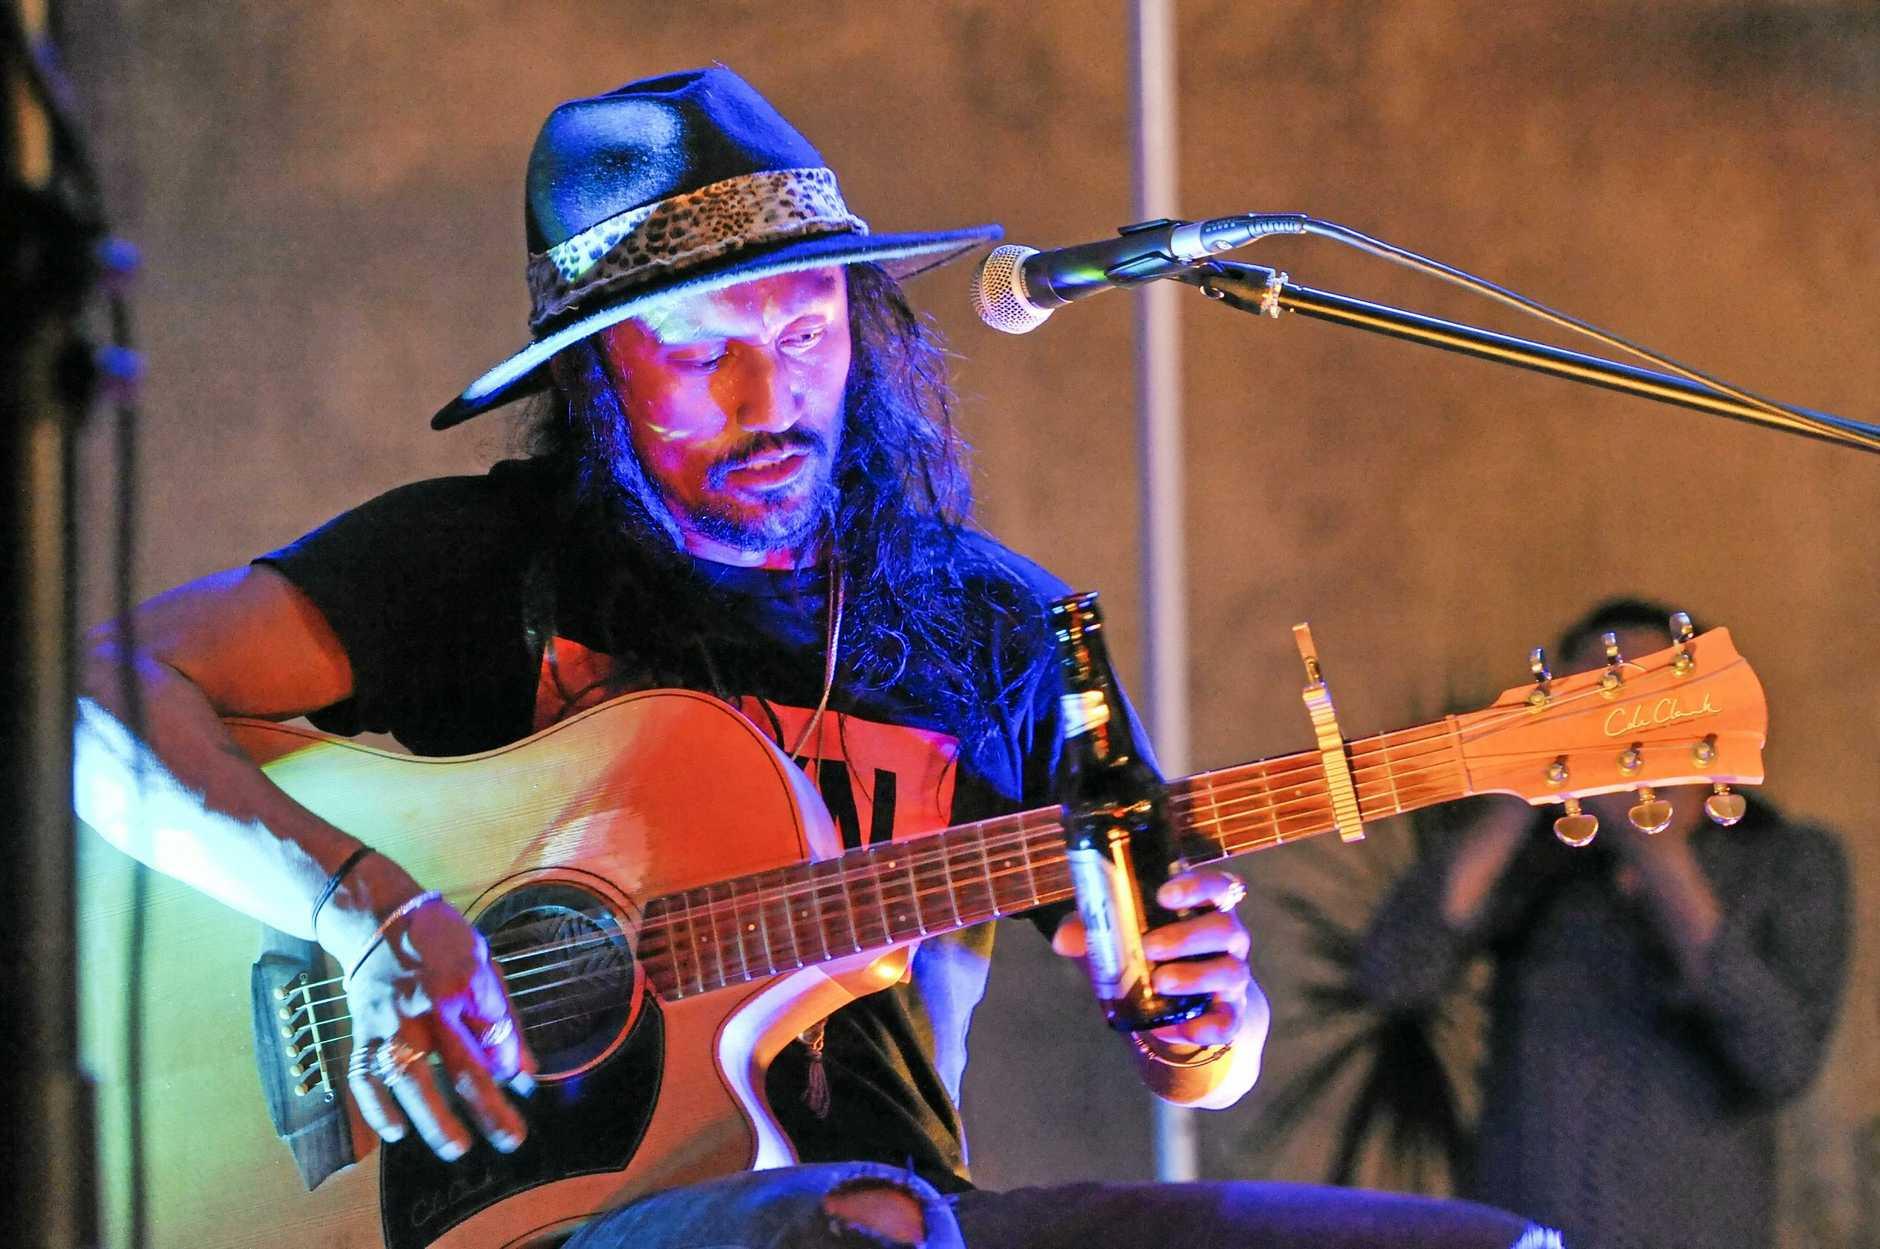 Jackson Dunn at Crow Street Food & Music Fest, on Saturday 24 February.